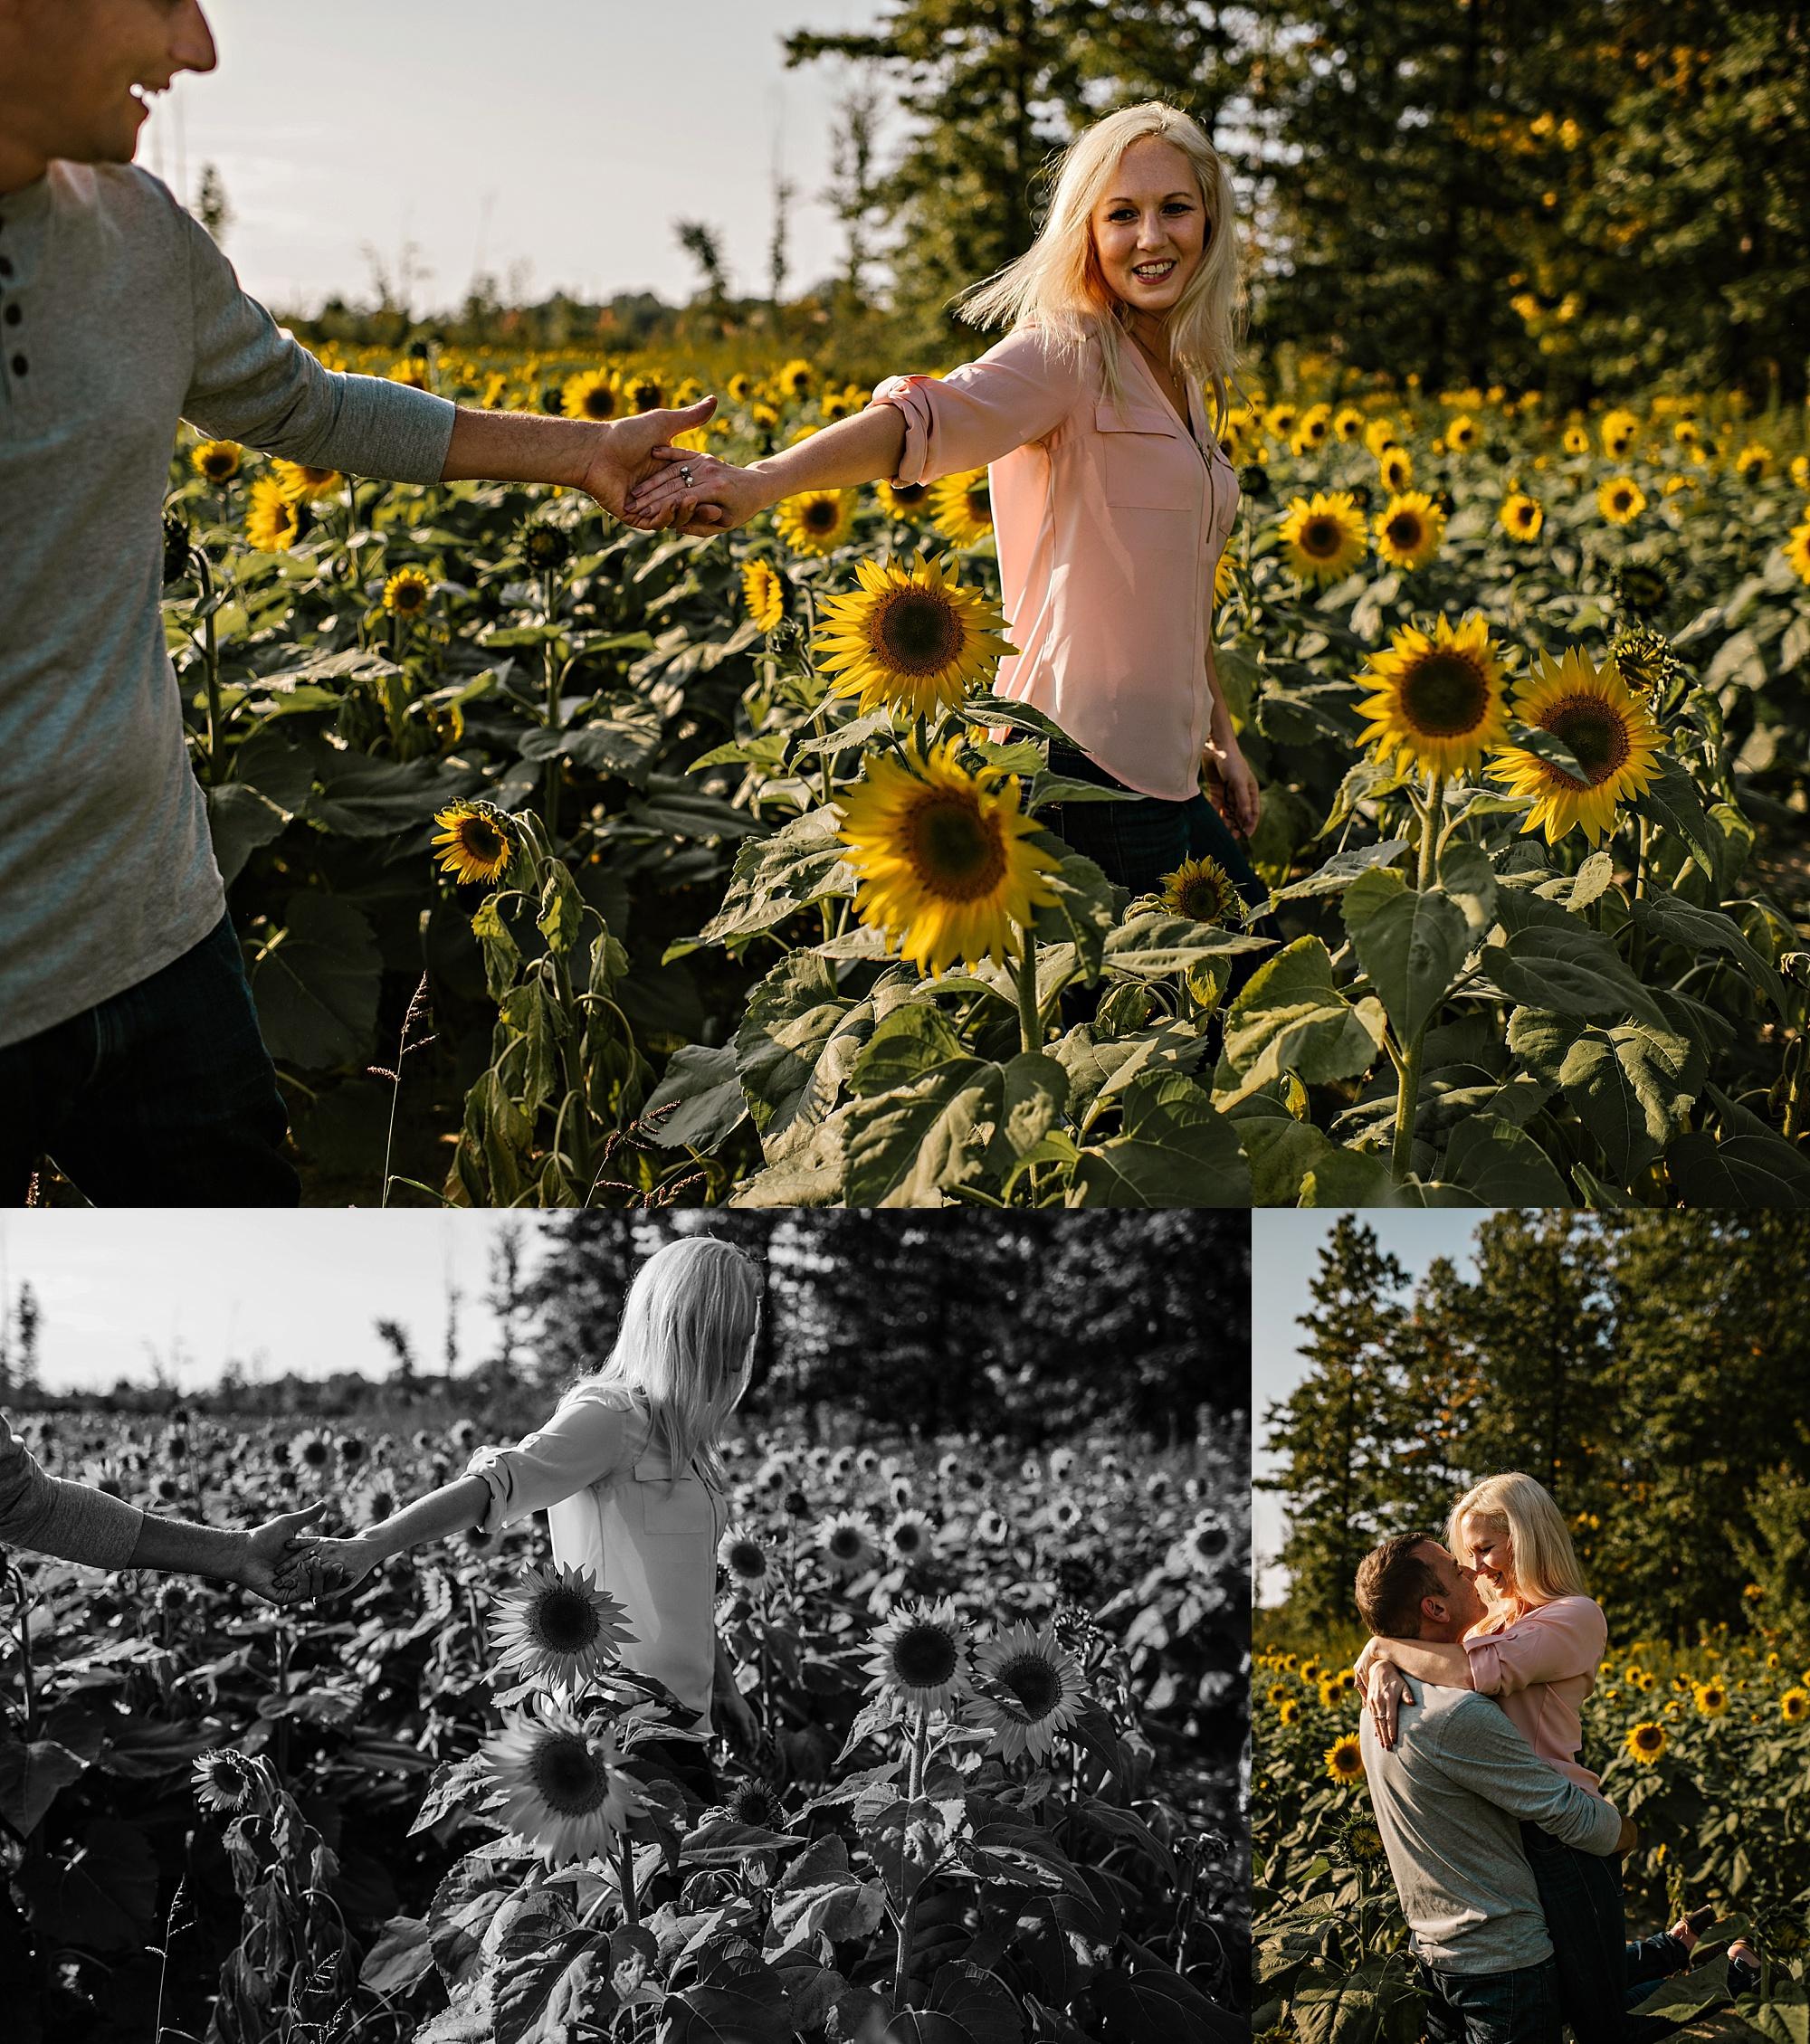 Lori-and-mike-akron-ohio-photographer-lauren-grayson-sunflower-field-session_0012.jpg